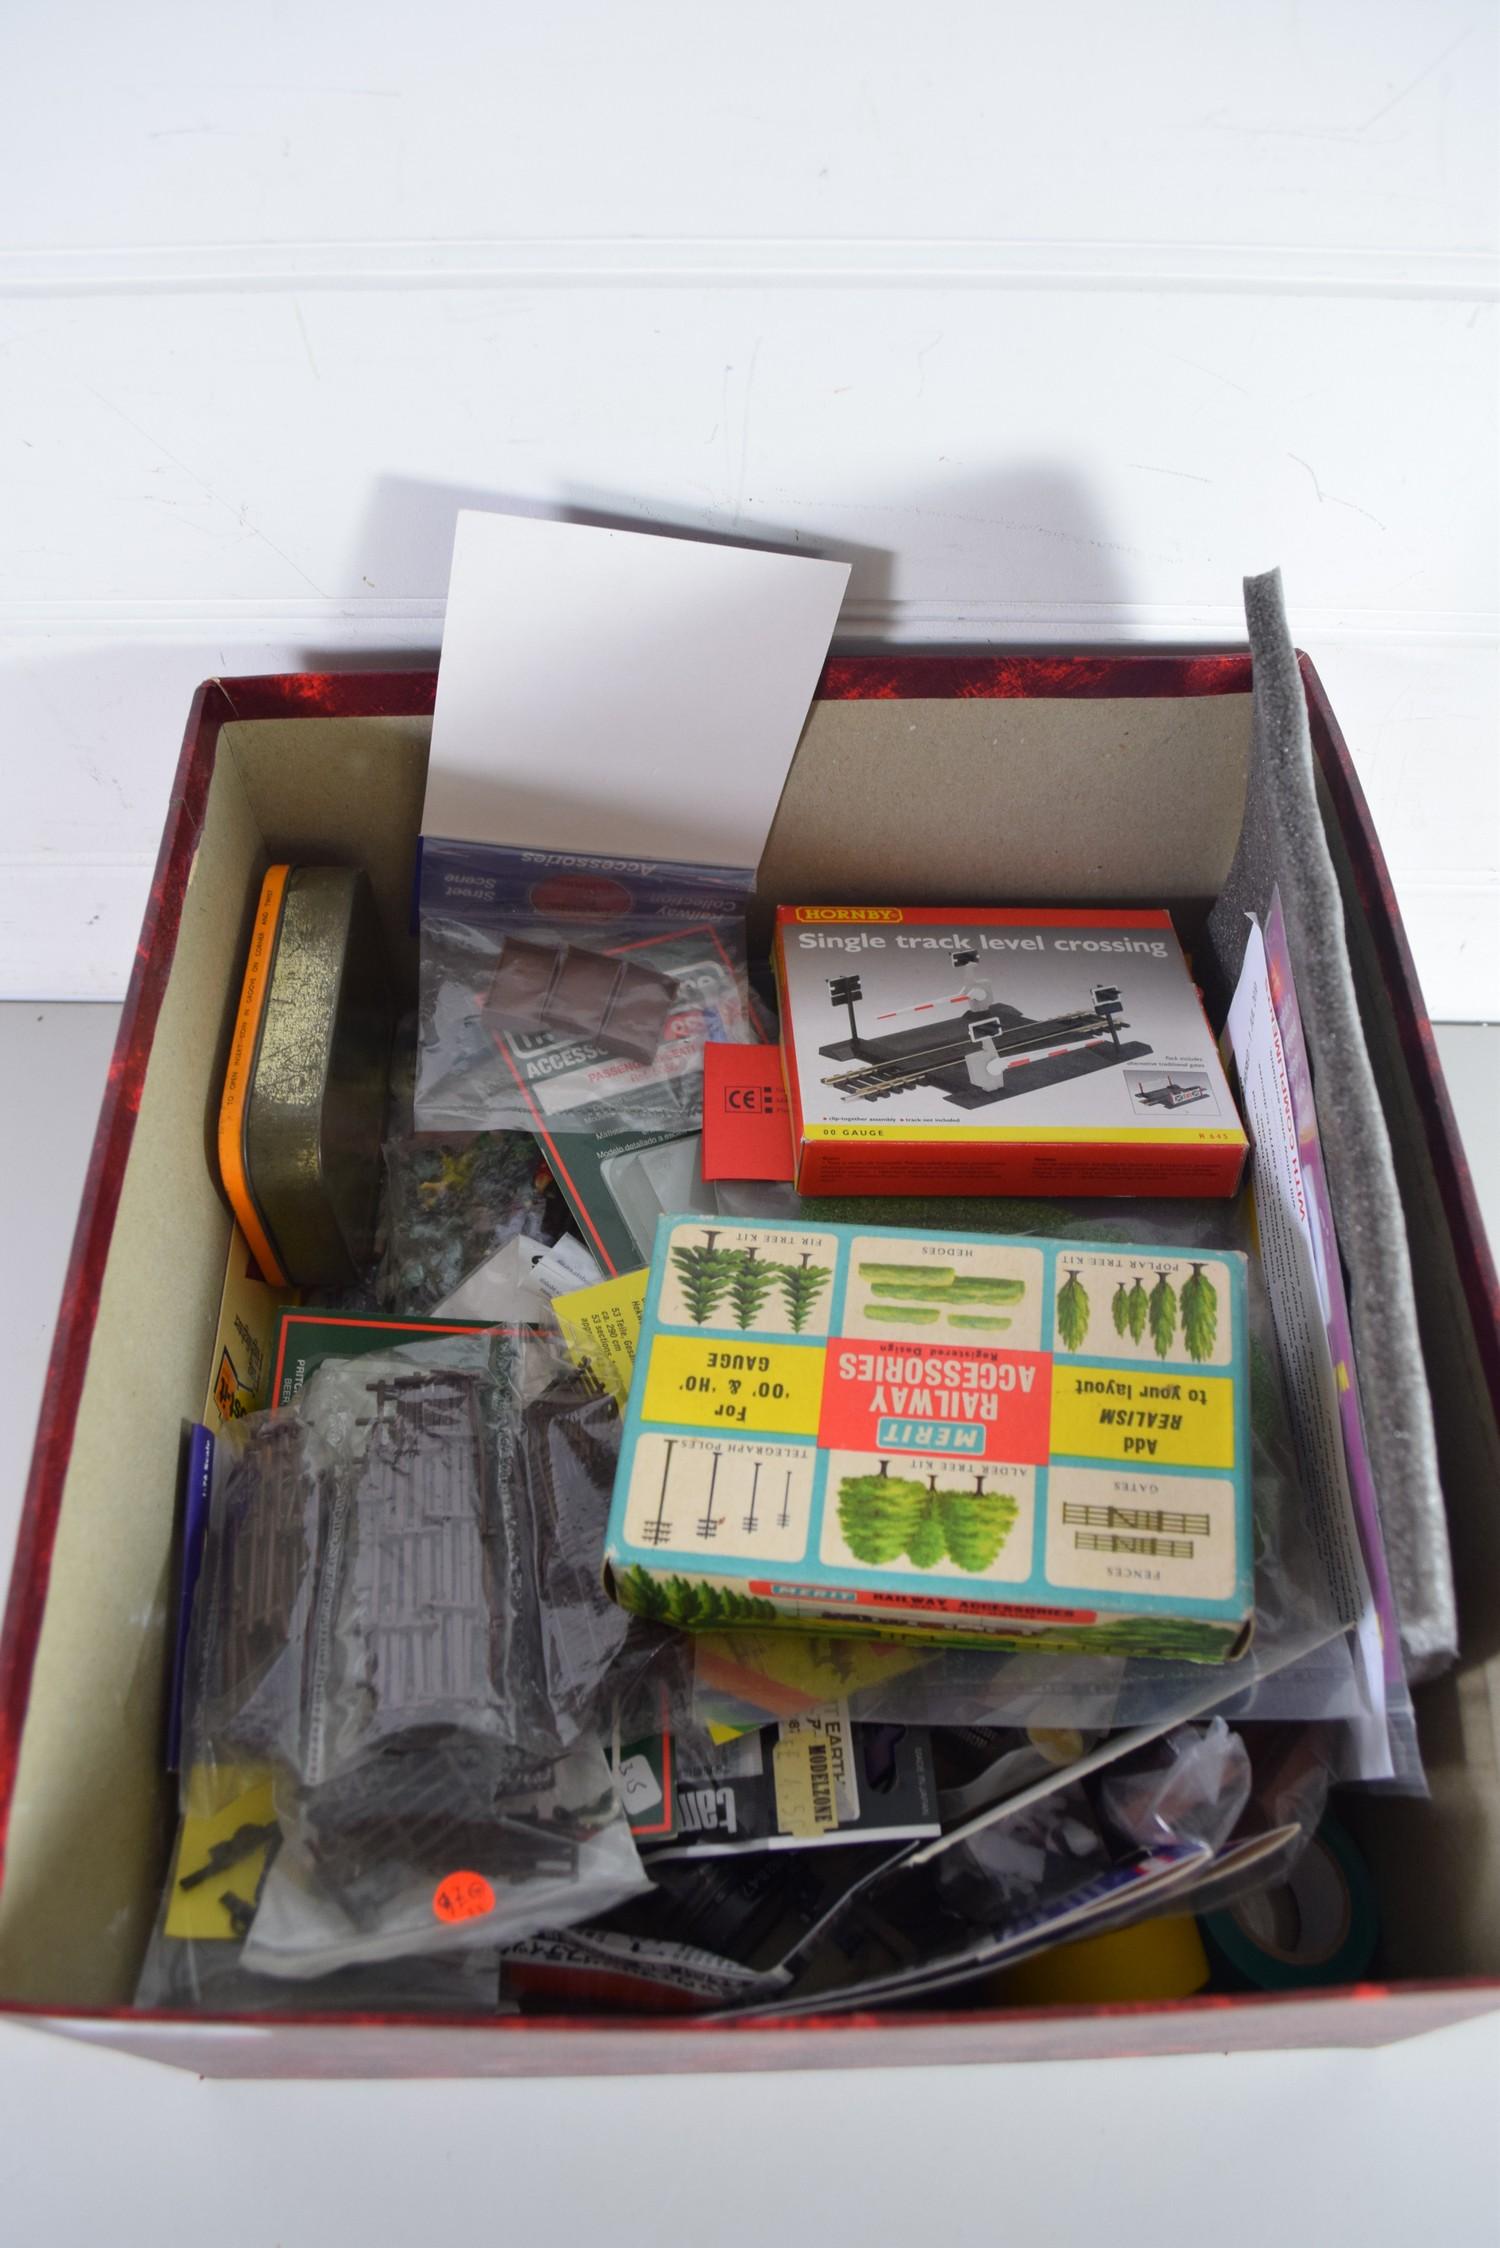 Box containing various model railway scenery accessories, figures etc